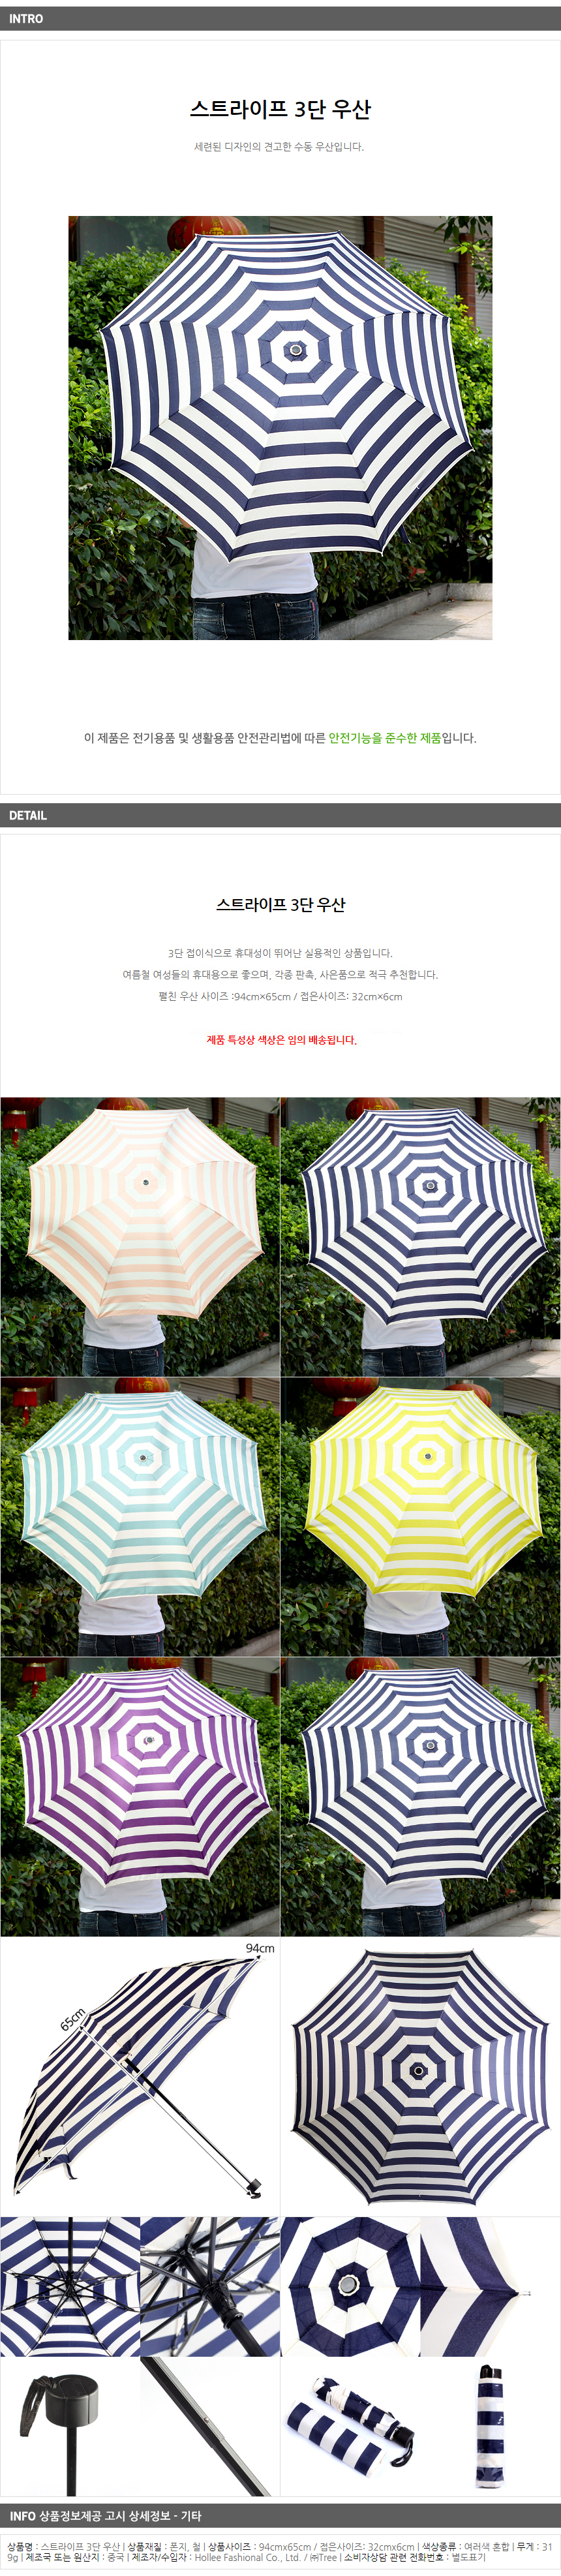 stripe 3단 휴대용우산 - 기프트갓, 6,000원, 우산, 수동3단/5단우산